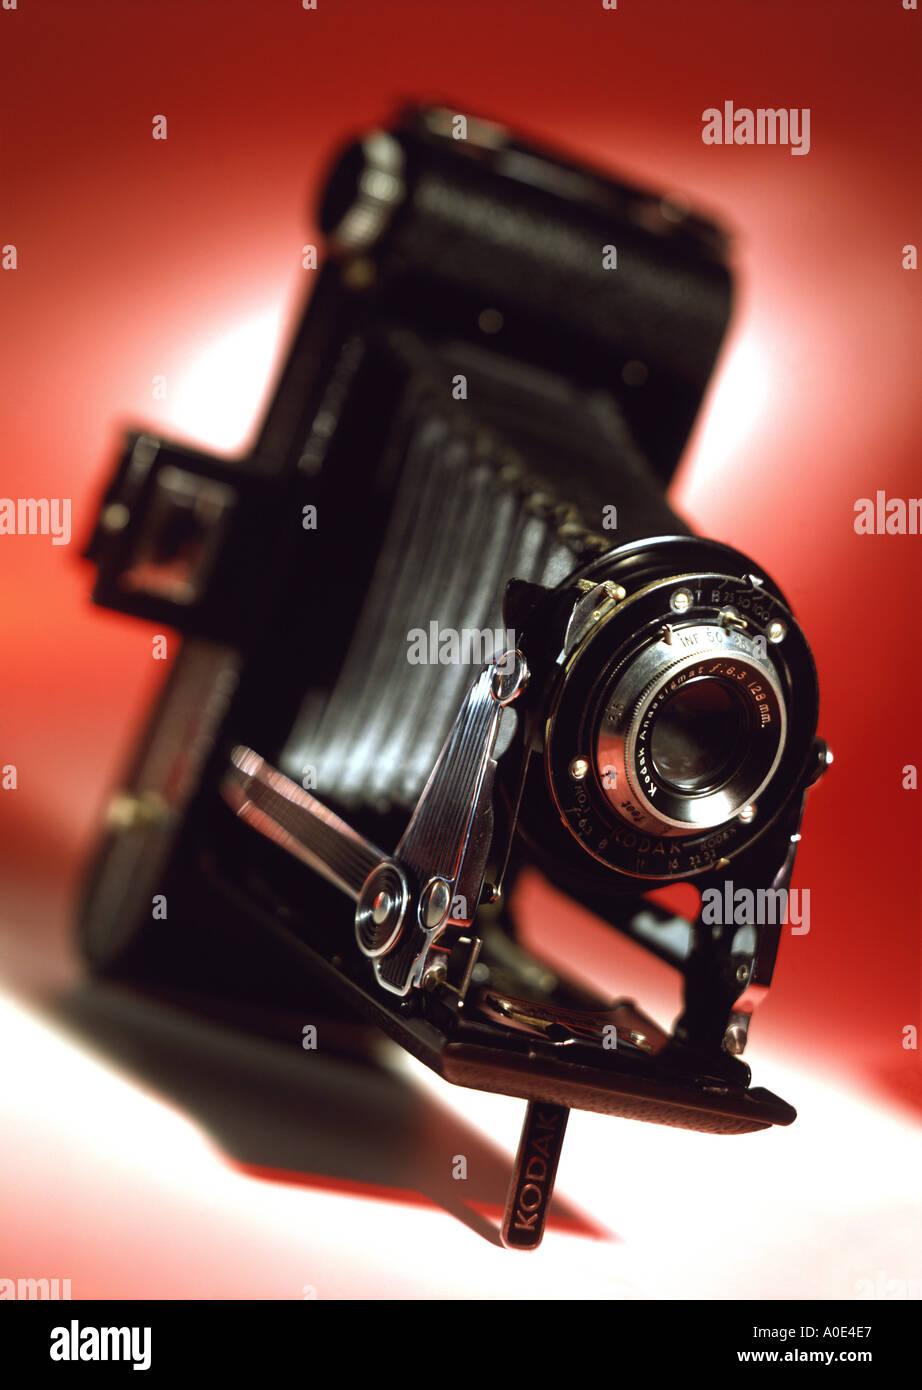 Kodak Camera - Stock Image